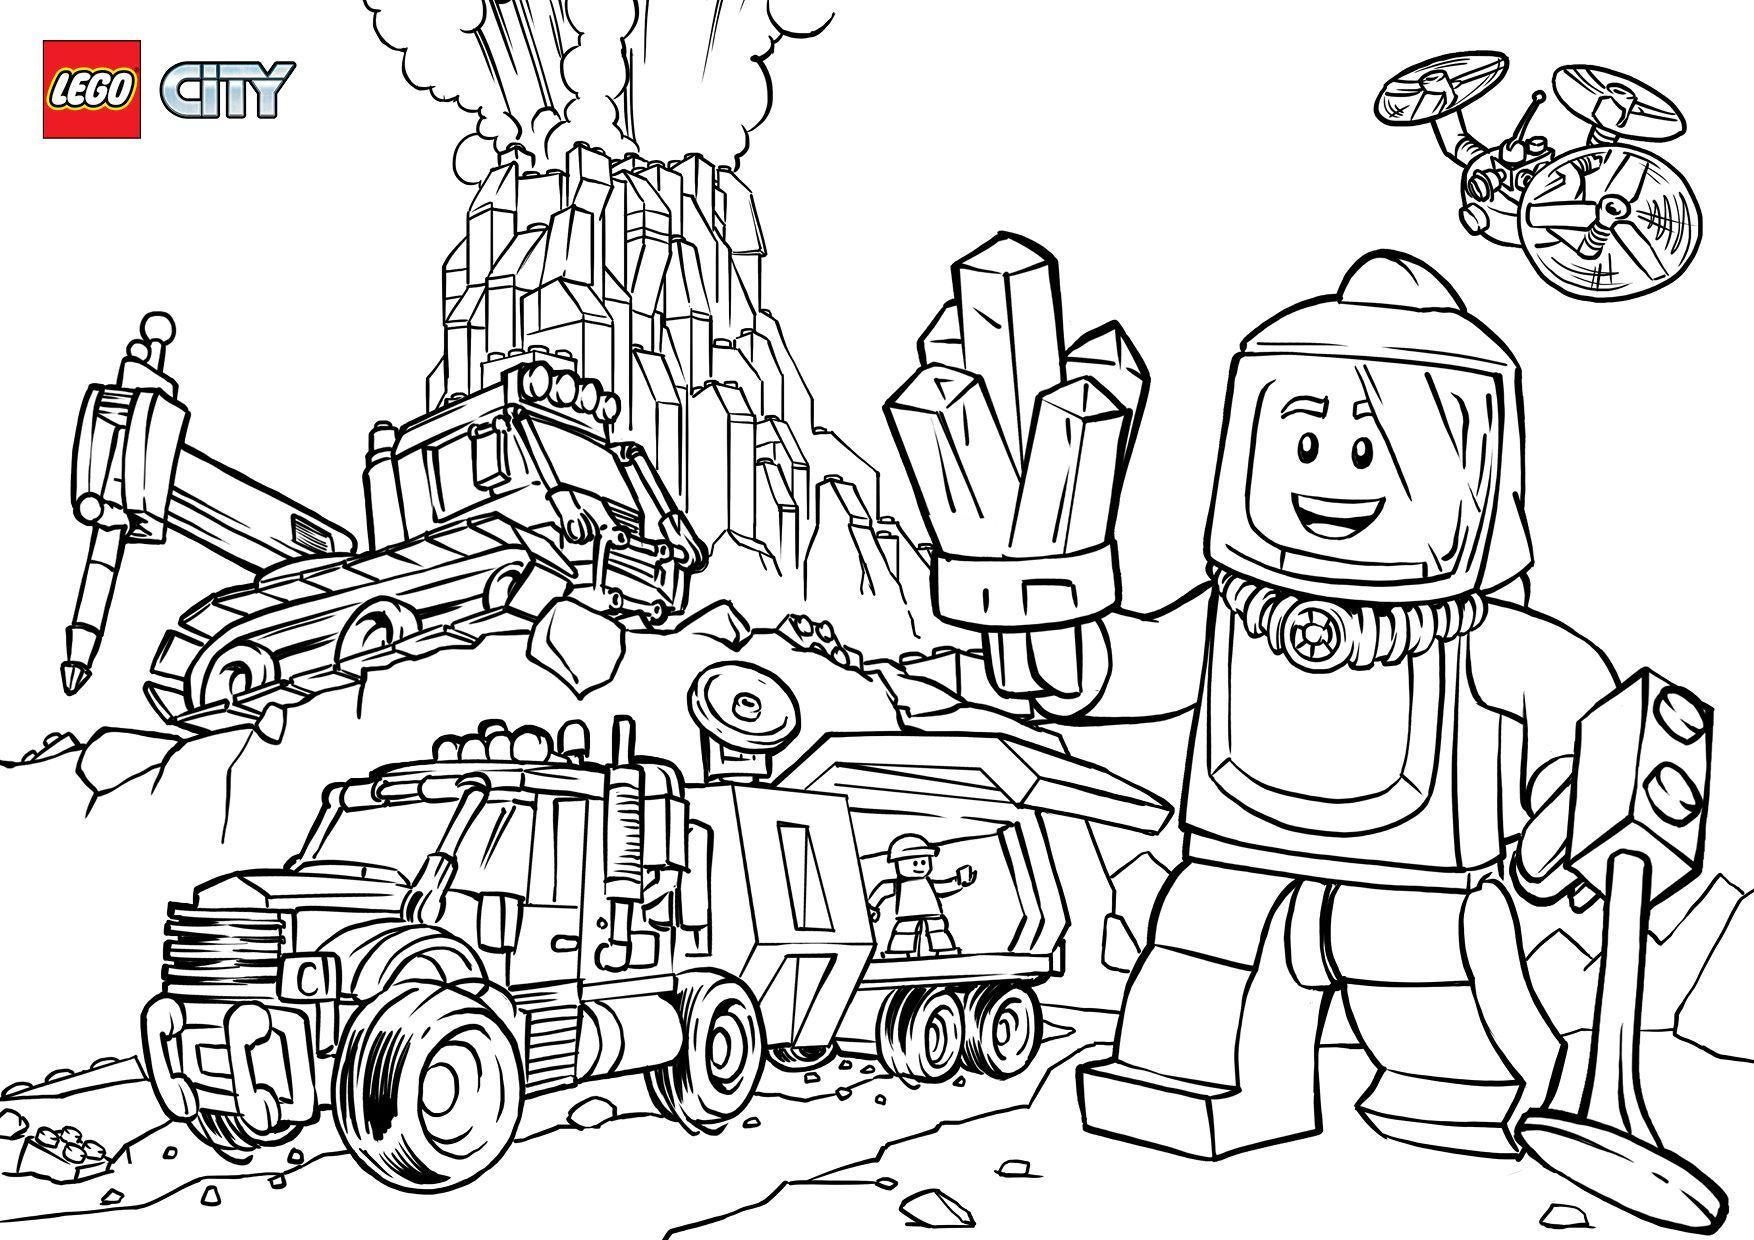 Lego Ausmalbilder City Ausmalbilder Ausmalbilder Zum Ausdrucken Kostenlos Ausmalbilder Zum Ausdrucken